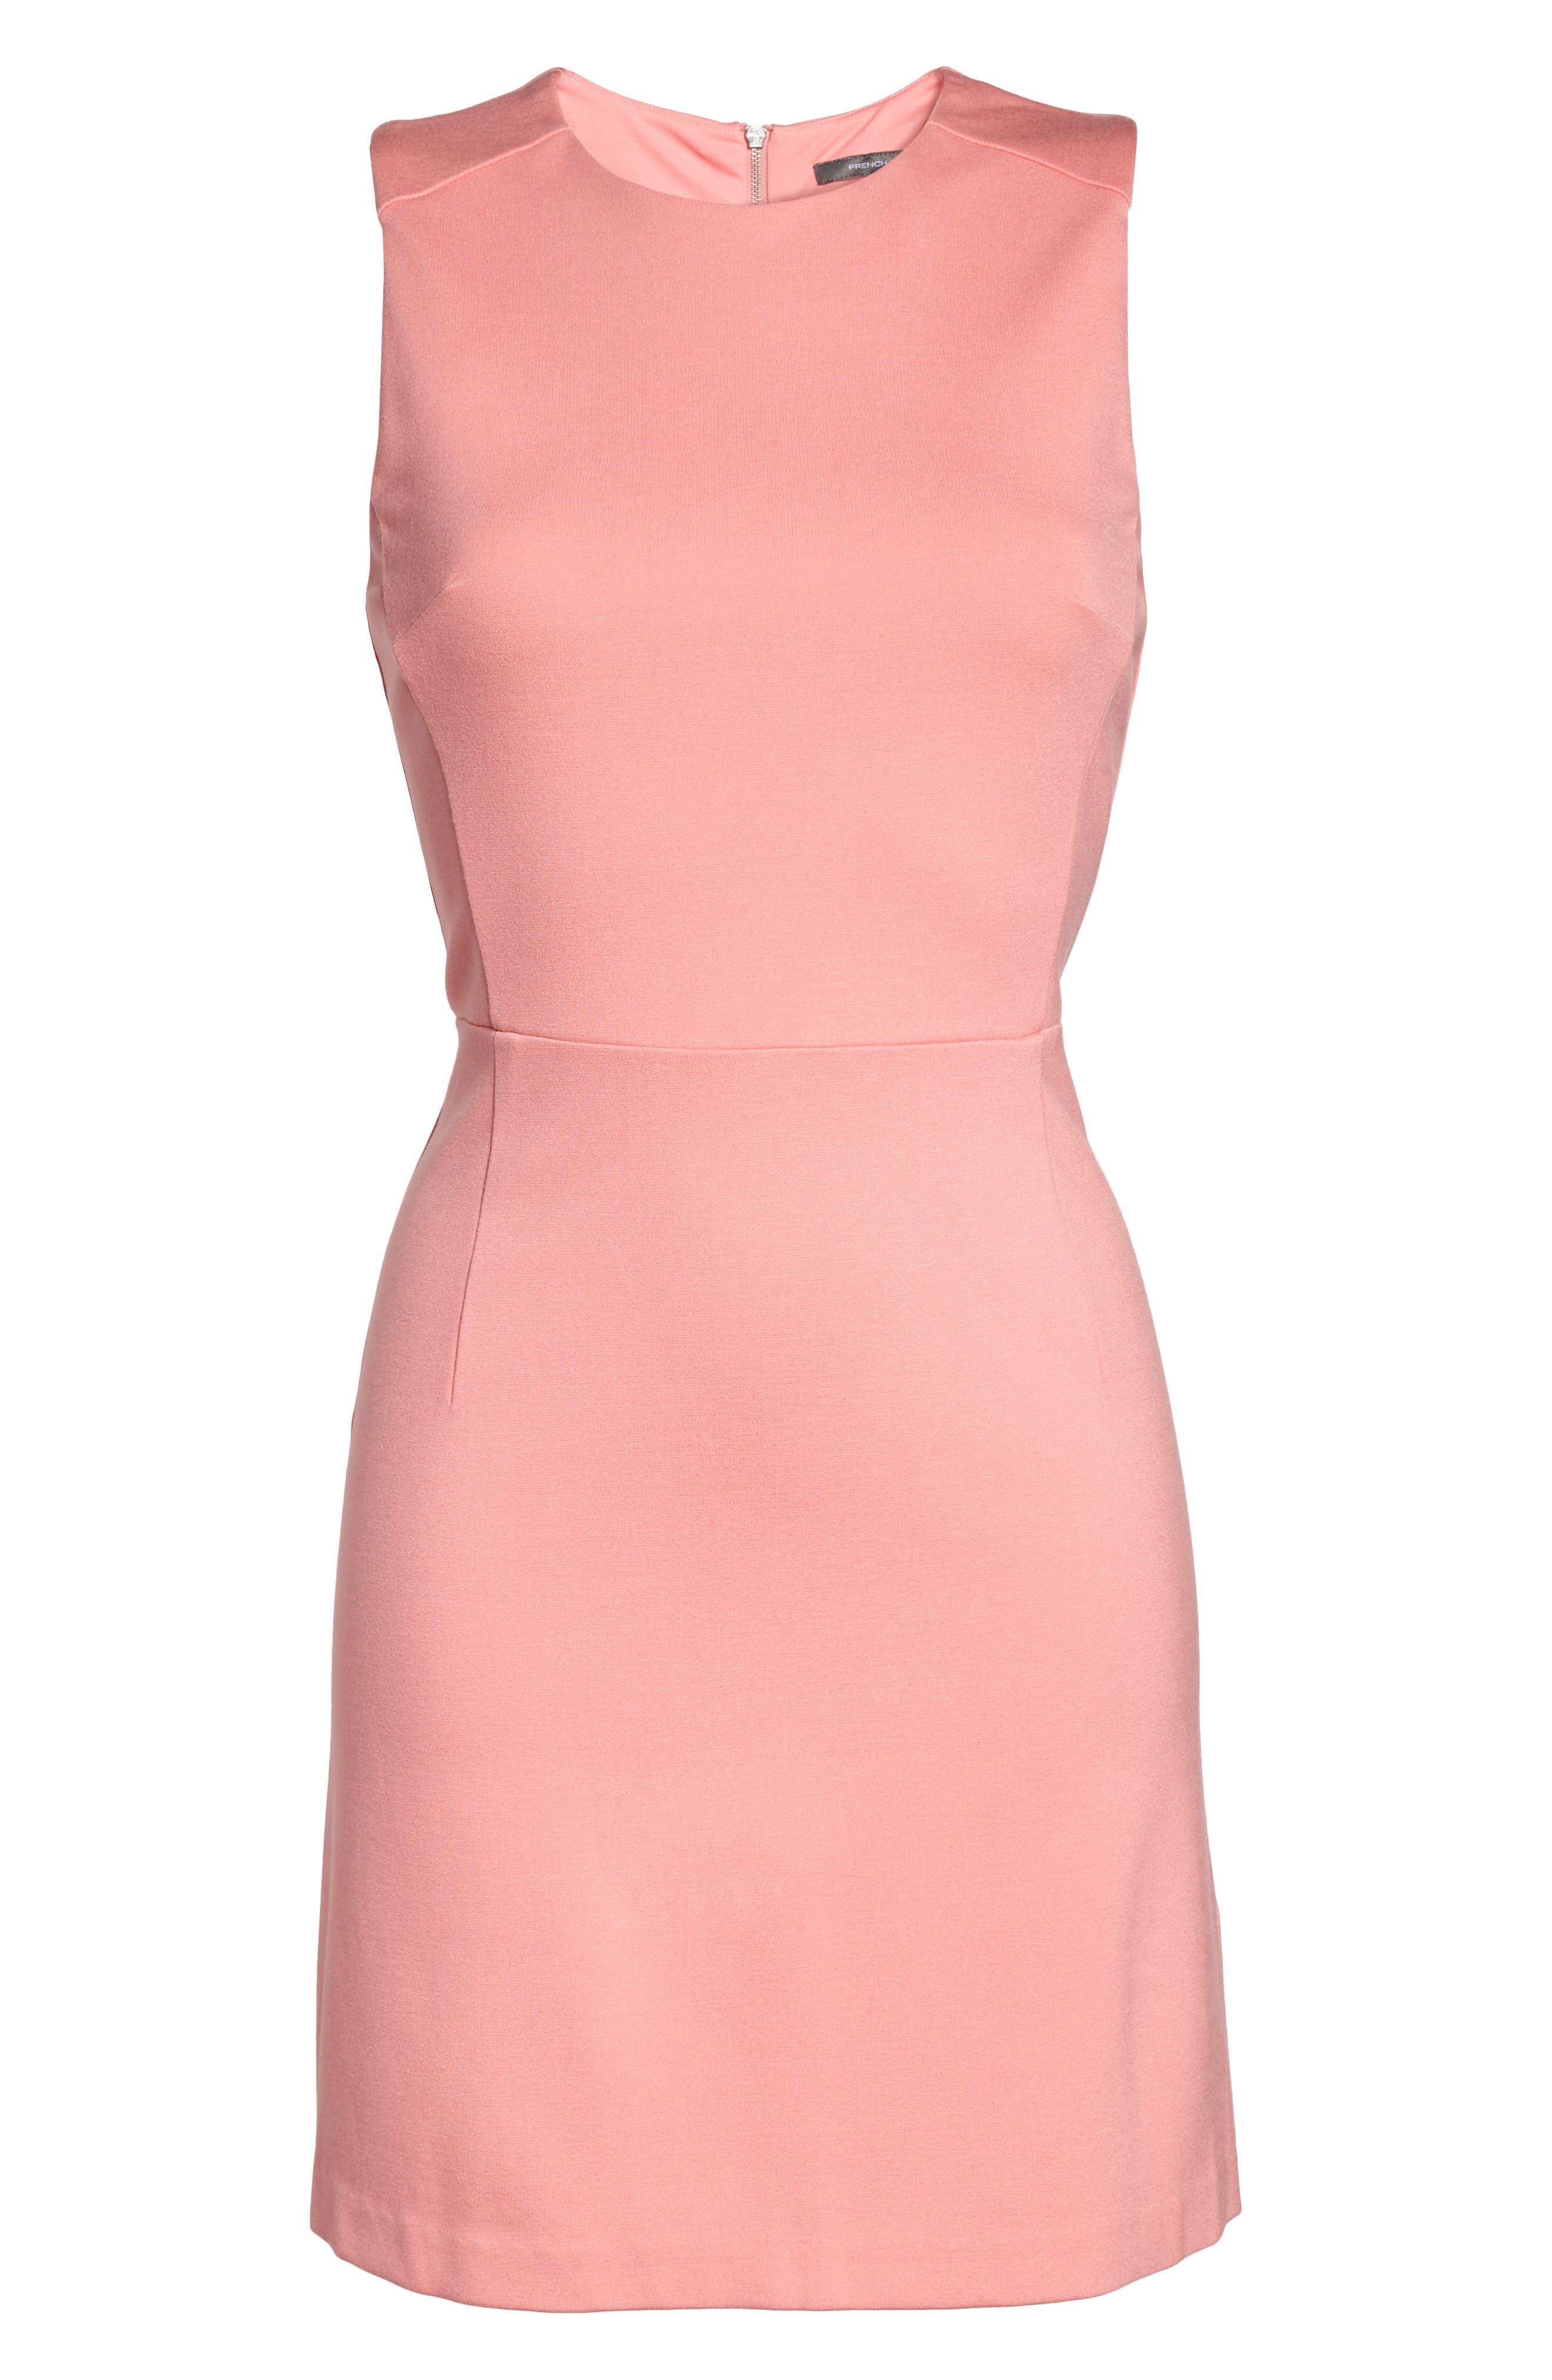 Lula Sheath Dress,                             Alternate thumbnail 6, color,                             Pink